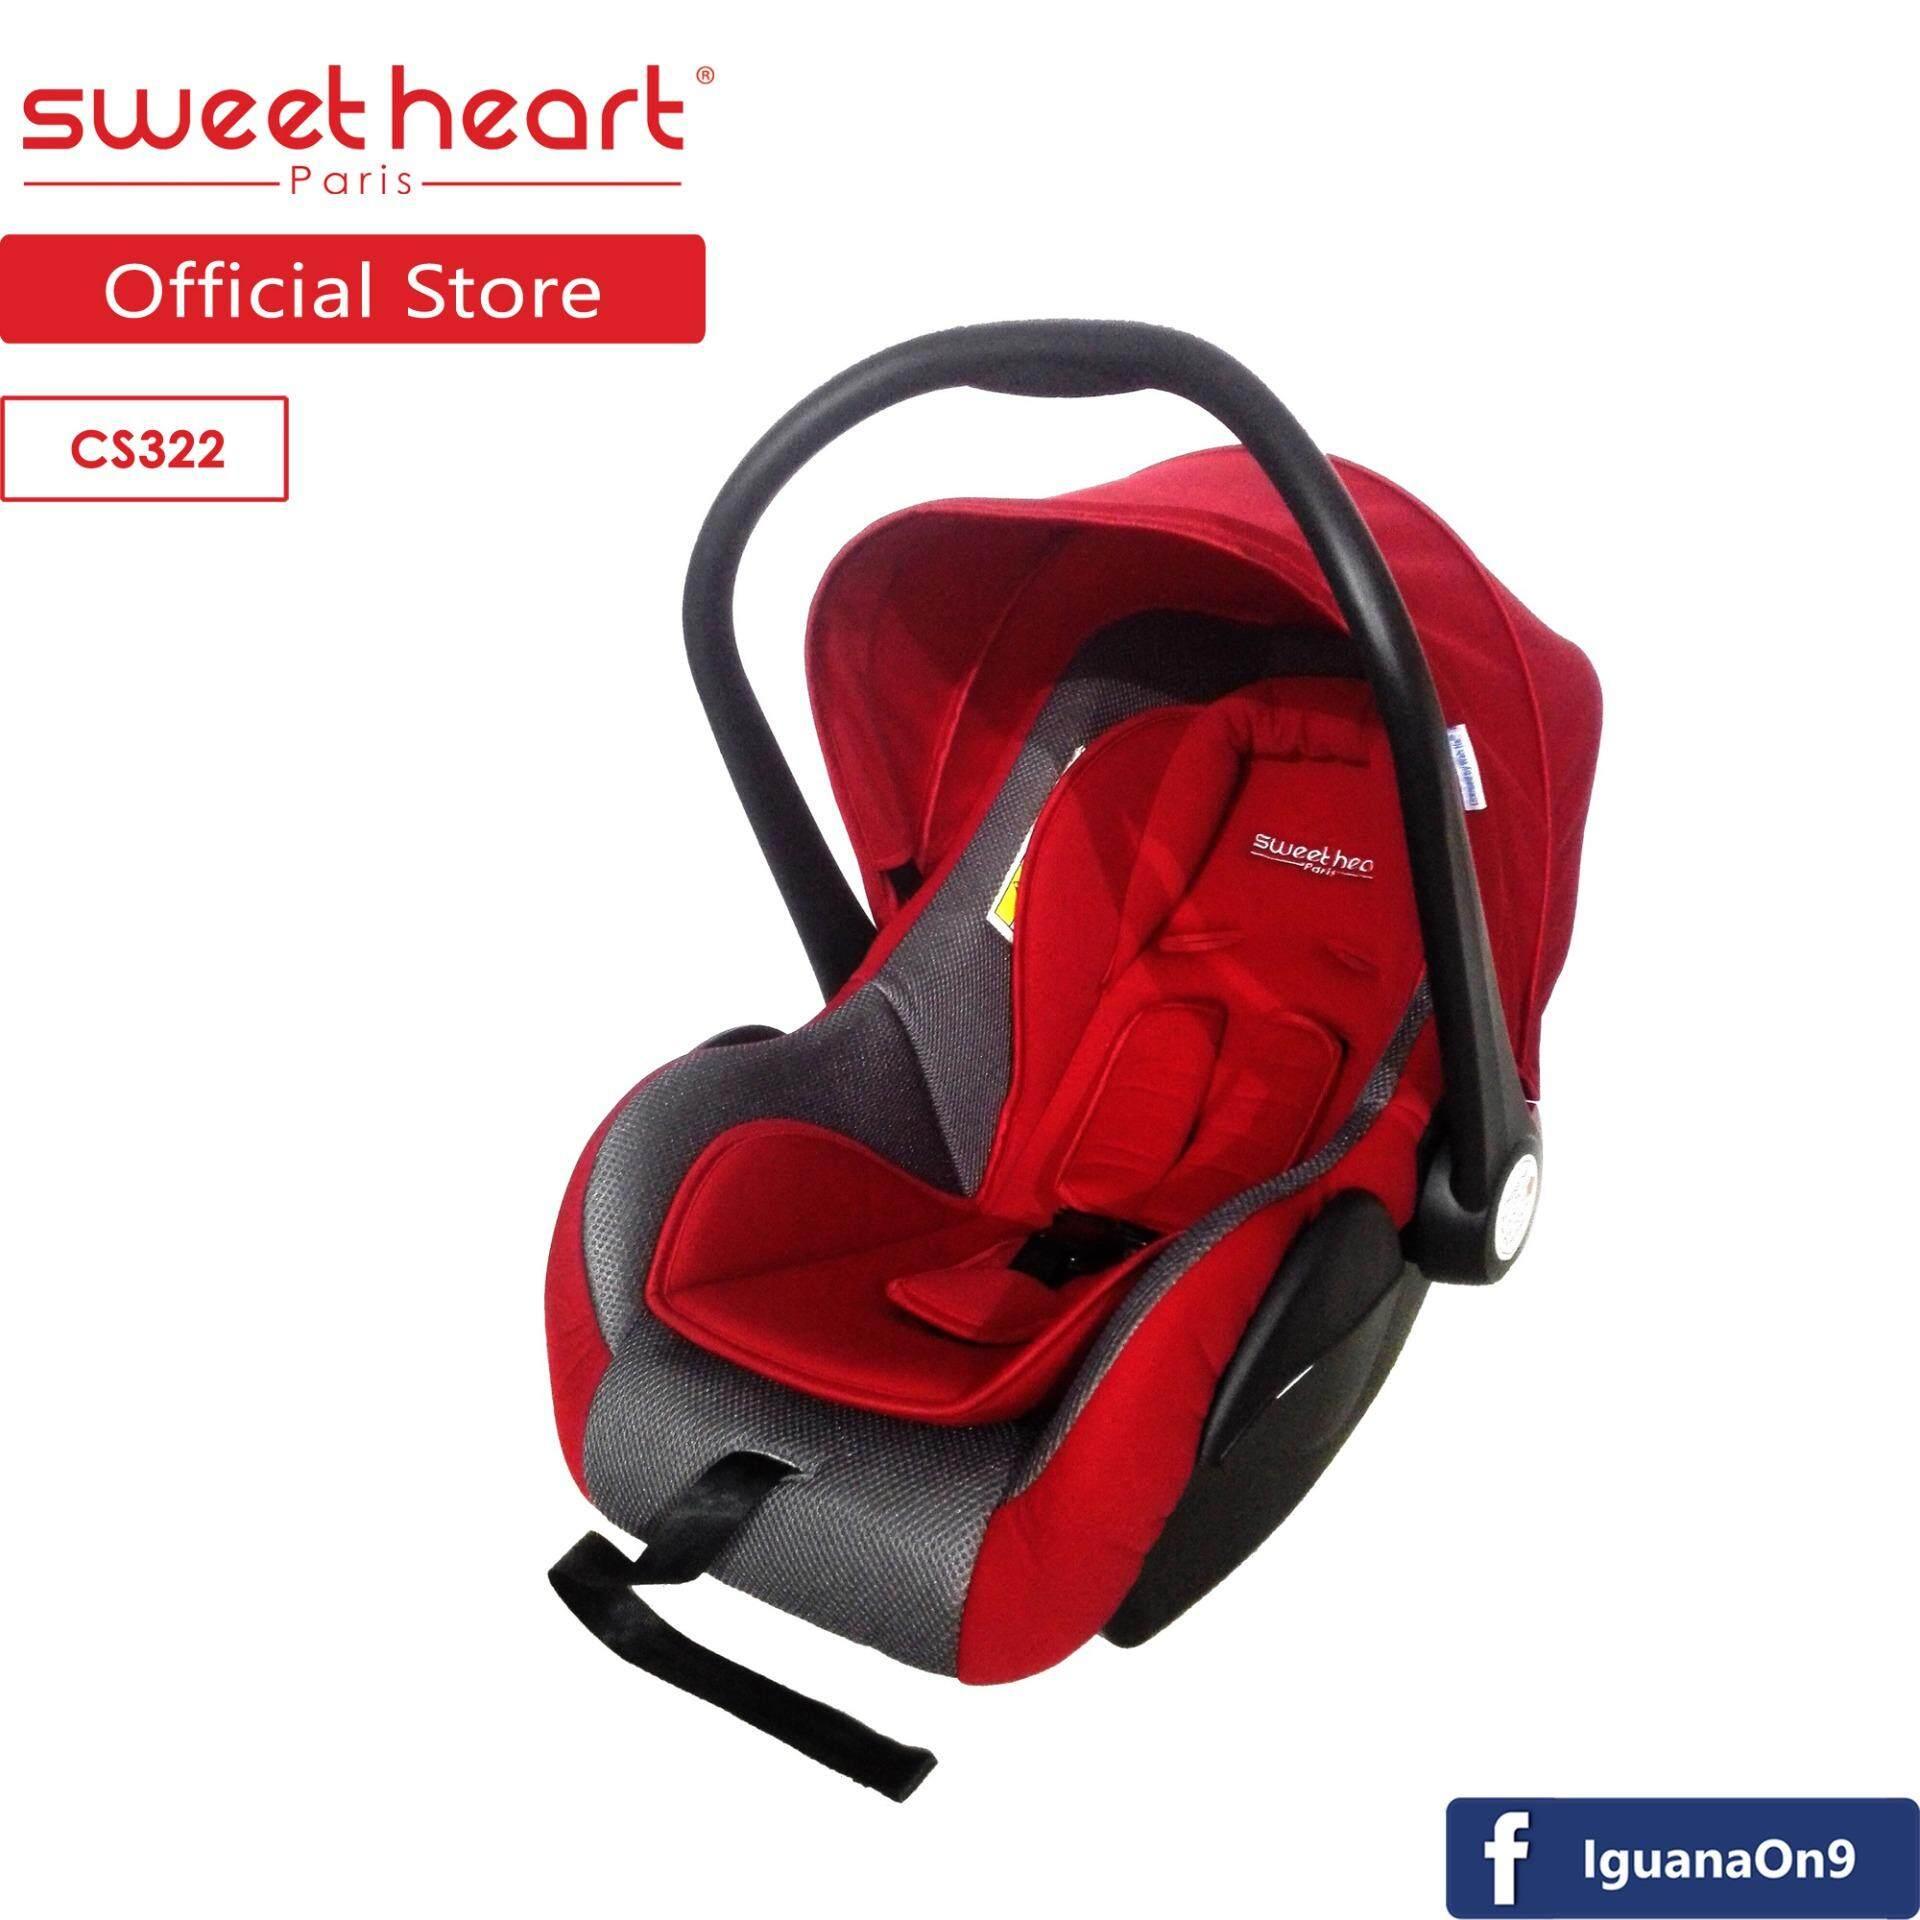 Sweet Heart Paris Cs322 Car Seat/carrier ใช้งานได้ดี คุณภาพสมราคา คาร์ซีทเด็กอ่อน With Ecer44 Standard.